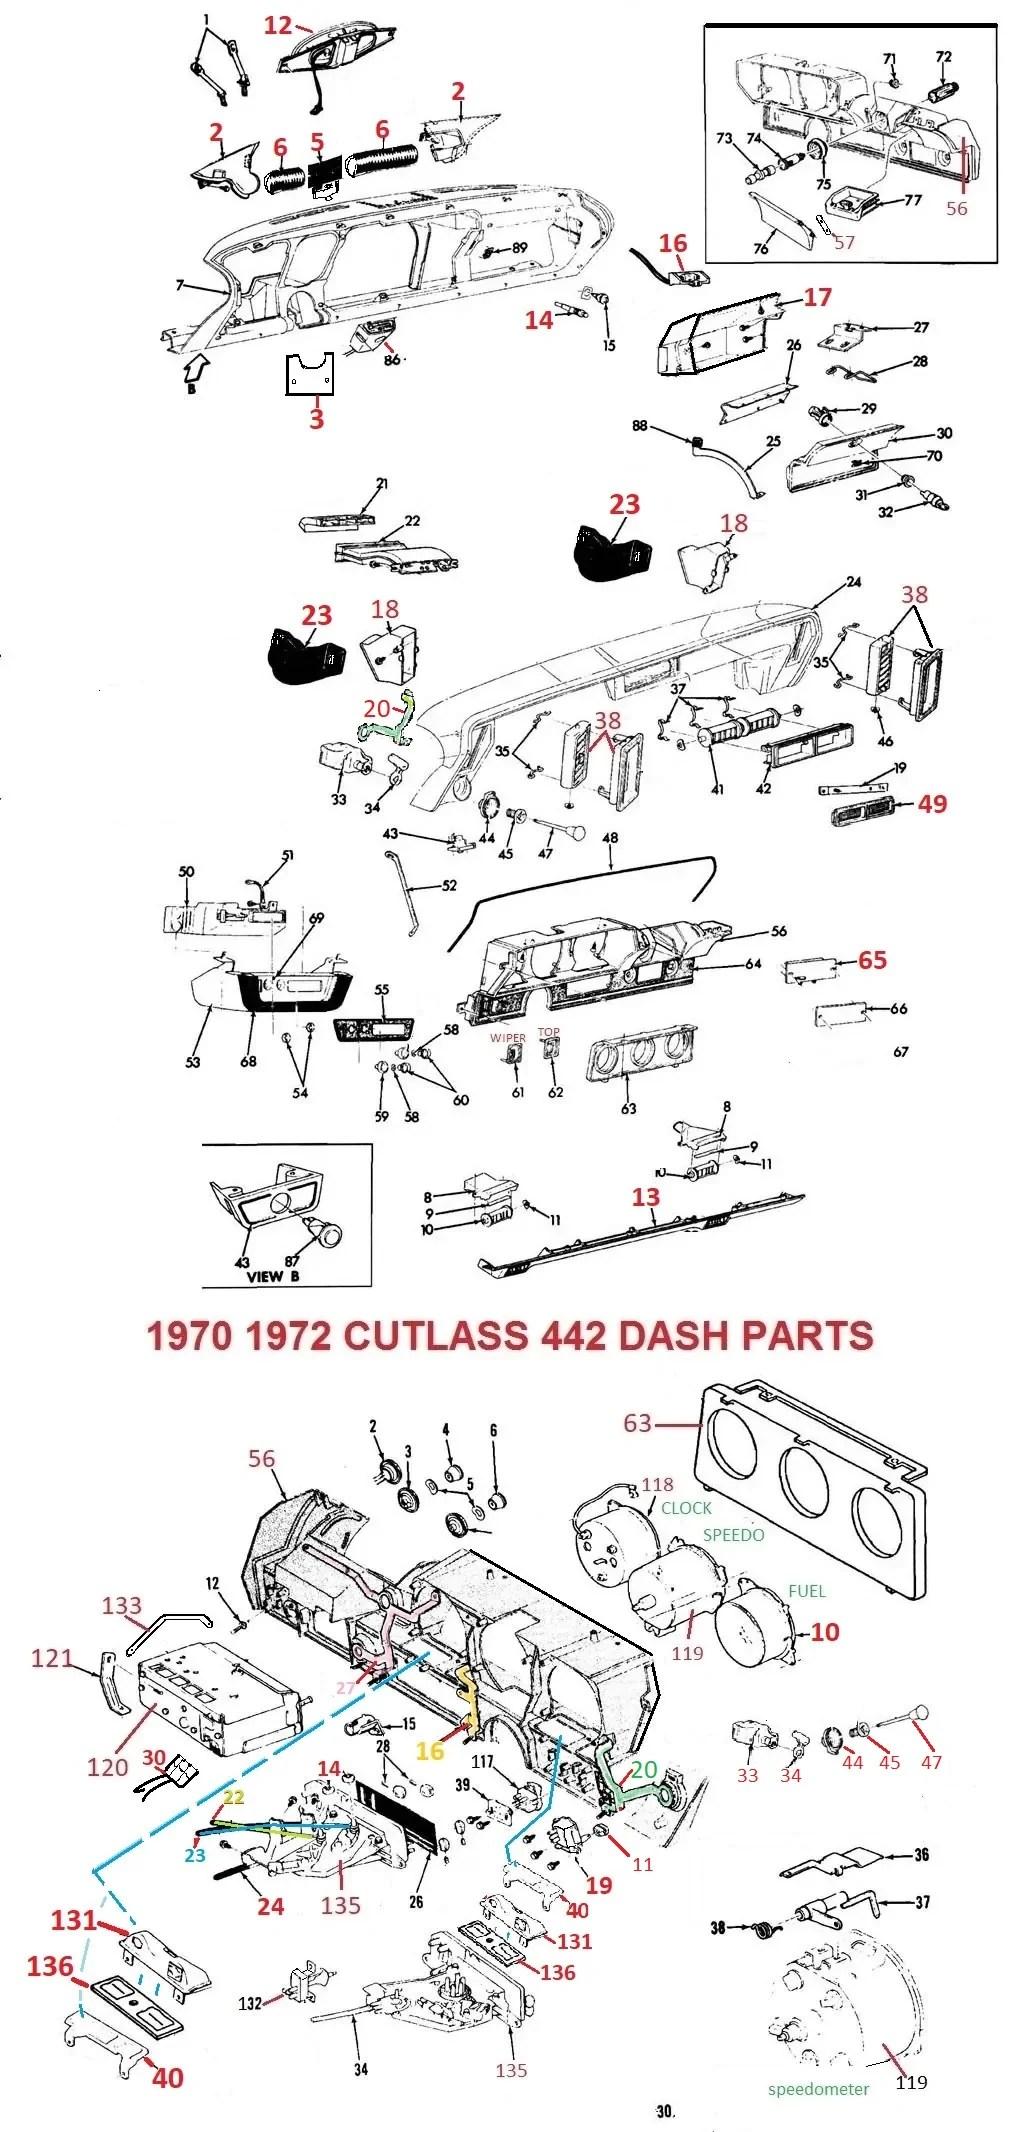 medium resolution of 70 71 72 cutlass 442 dash parts